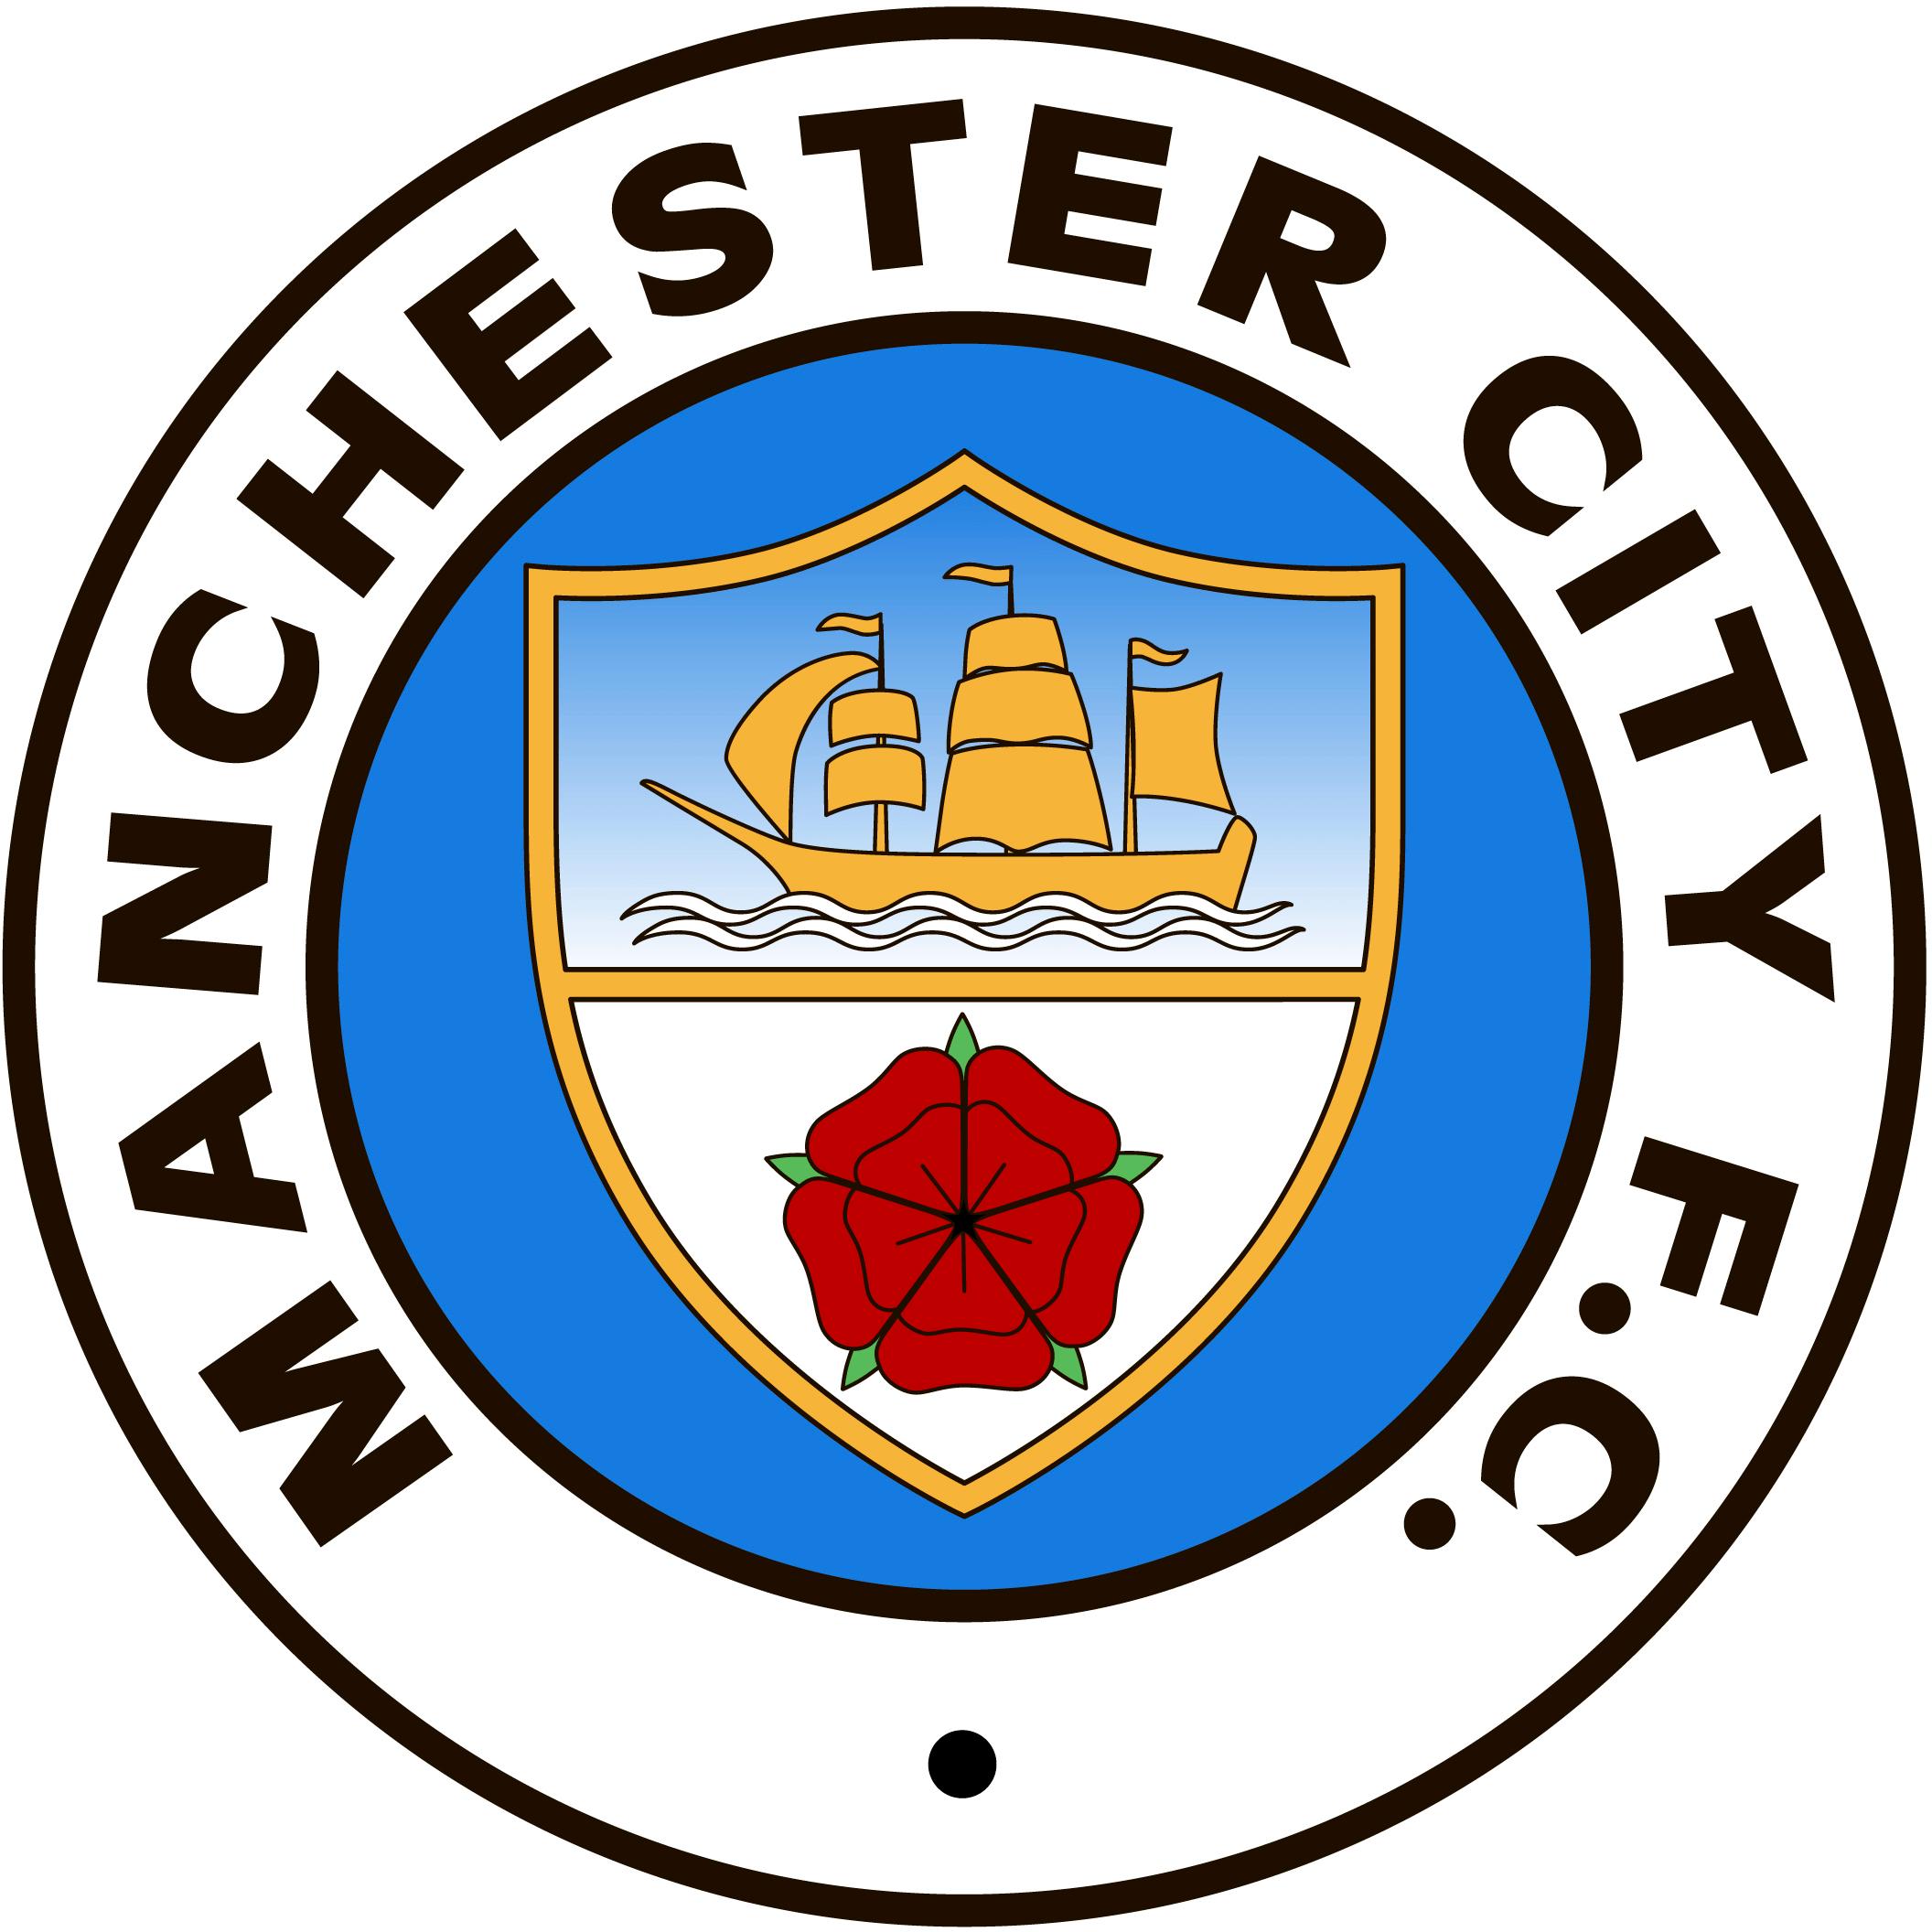 Эмблема, торговая марка, спорт png 3840x2160px 361.1kb; âš½ Эмблема ФК «Манчестер Сити»: значение логотипа